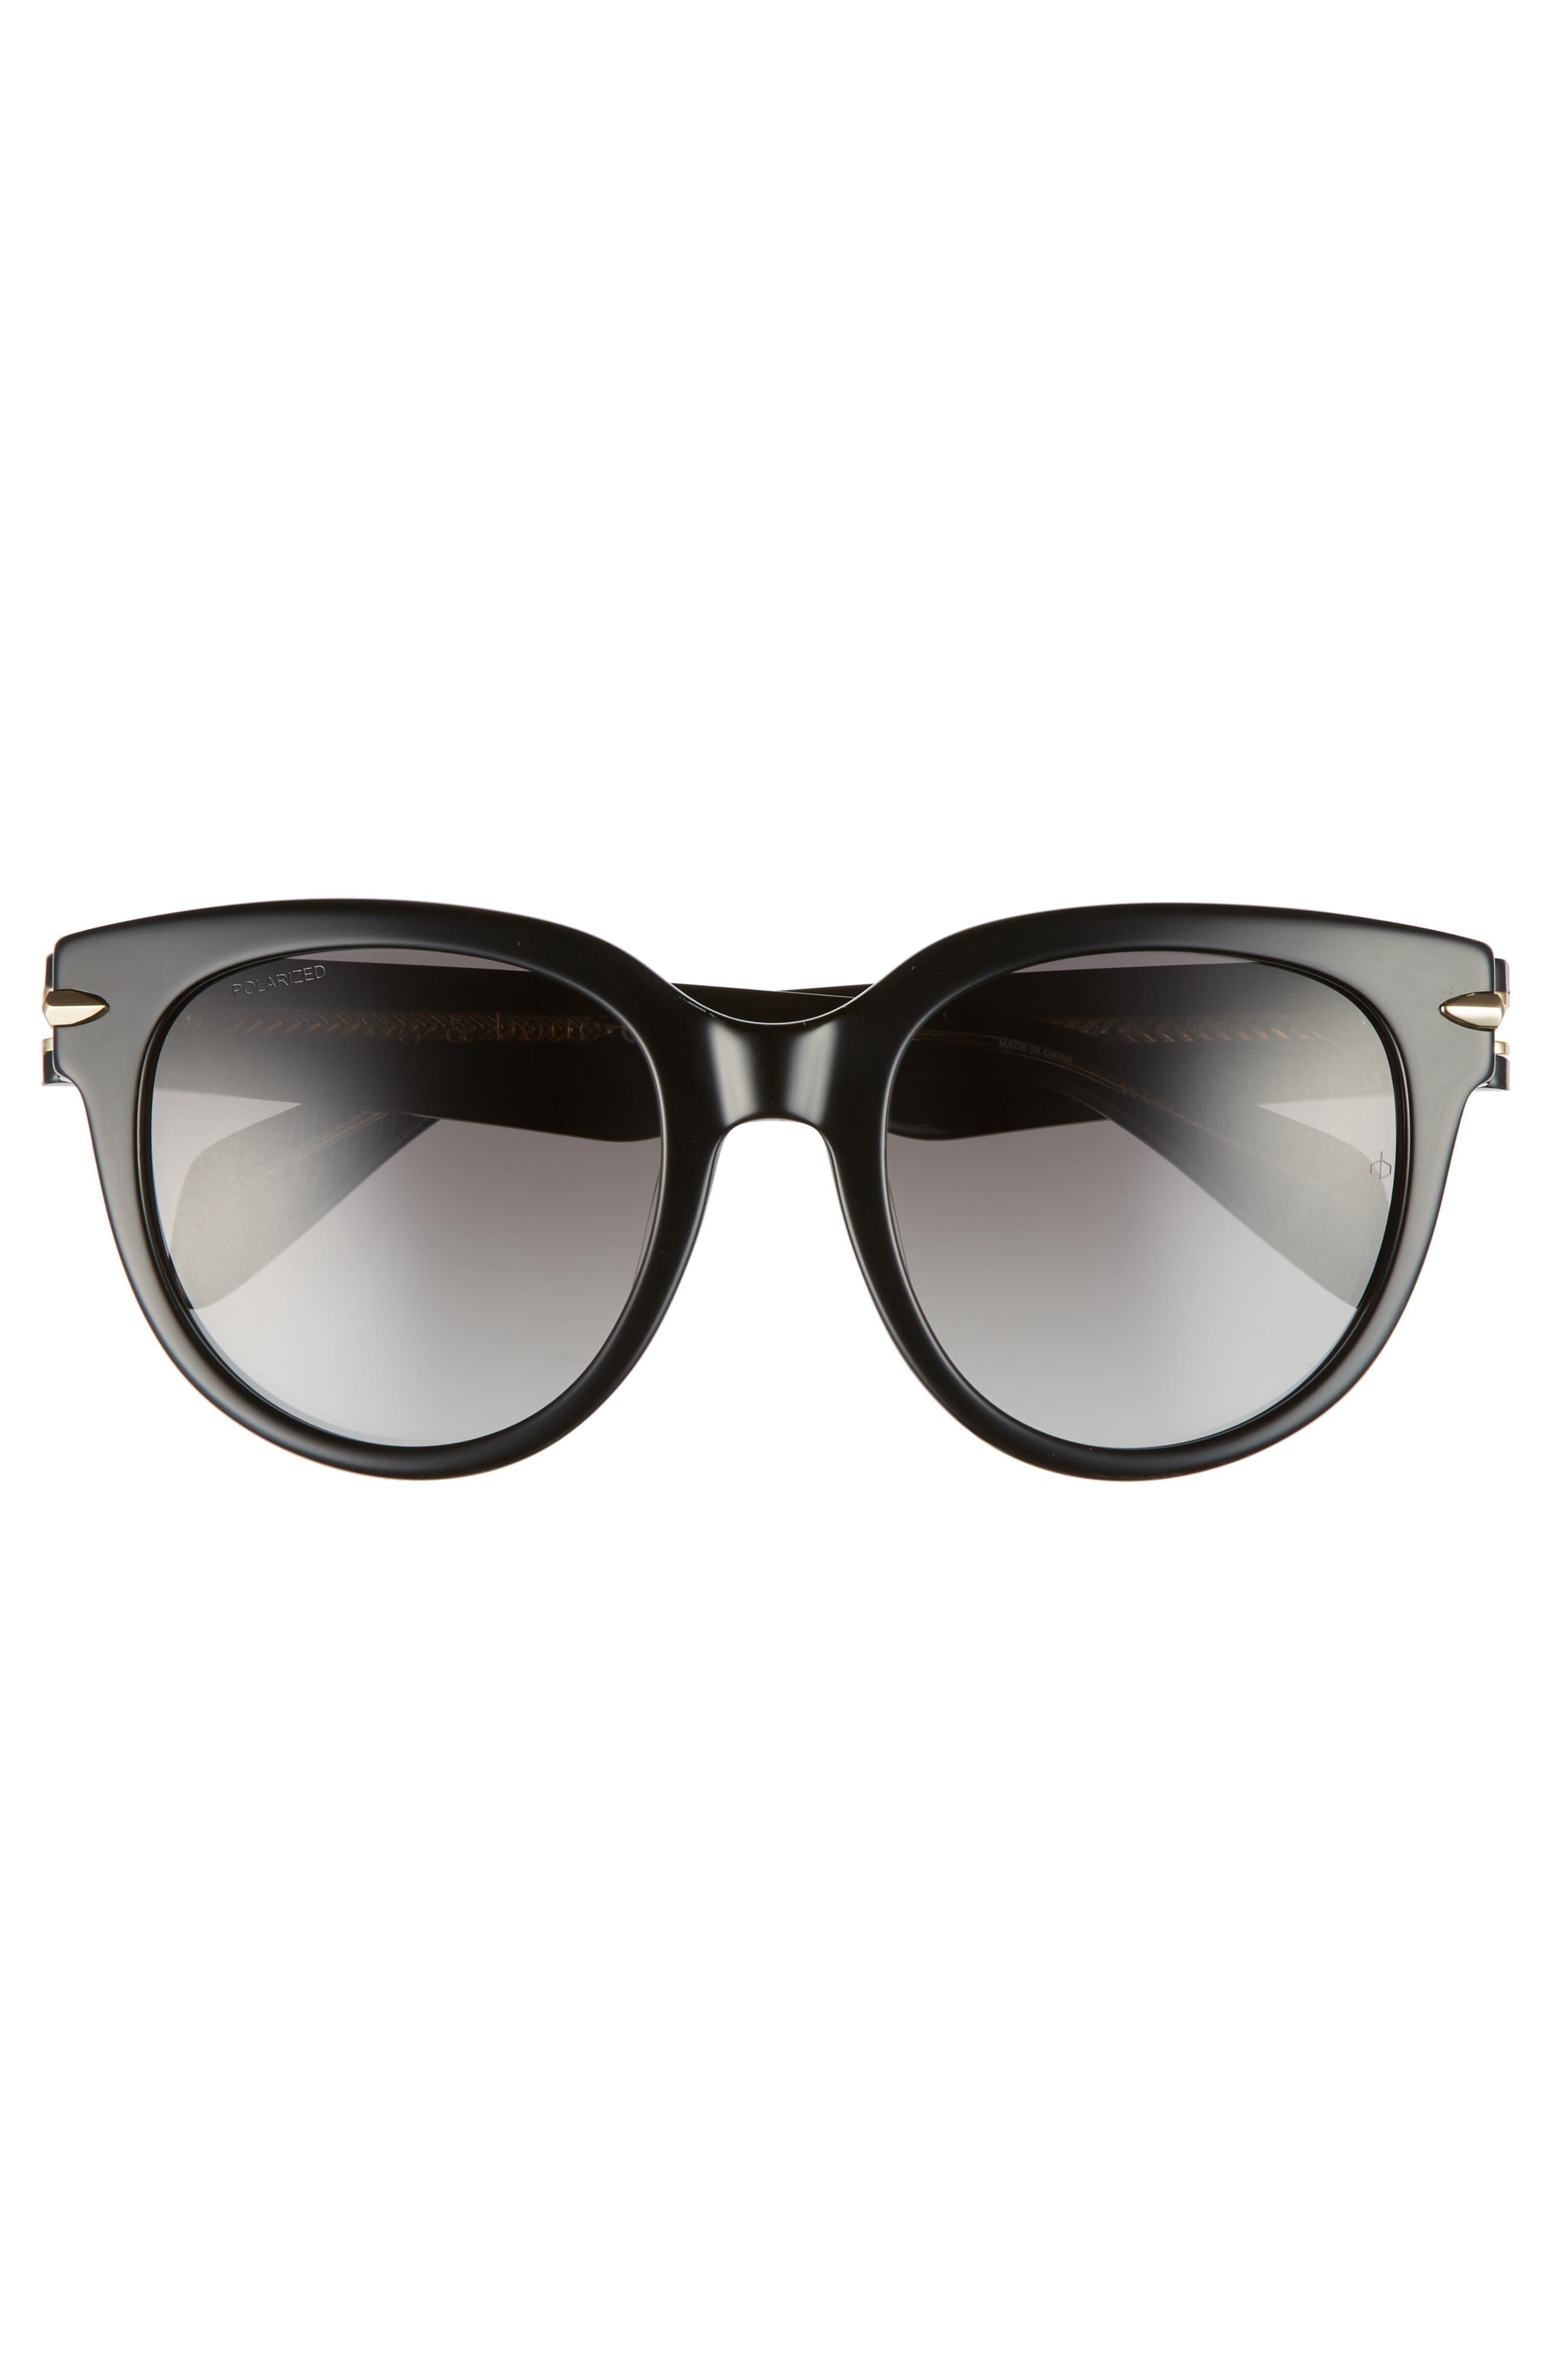 54mm Round Sunglasses,                             Alternate thumbnail 3, color,                             001